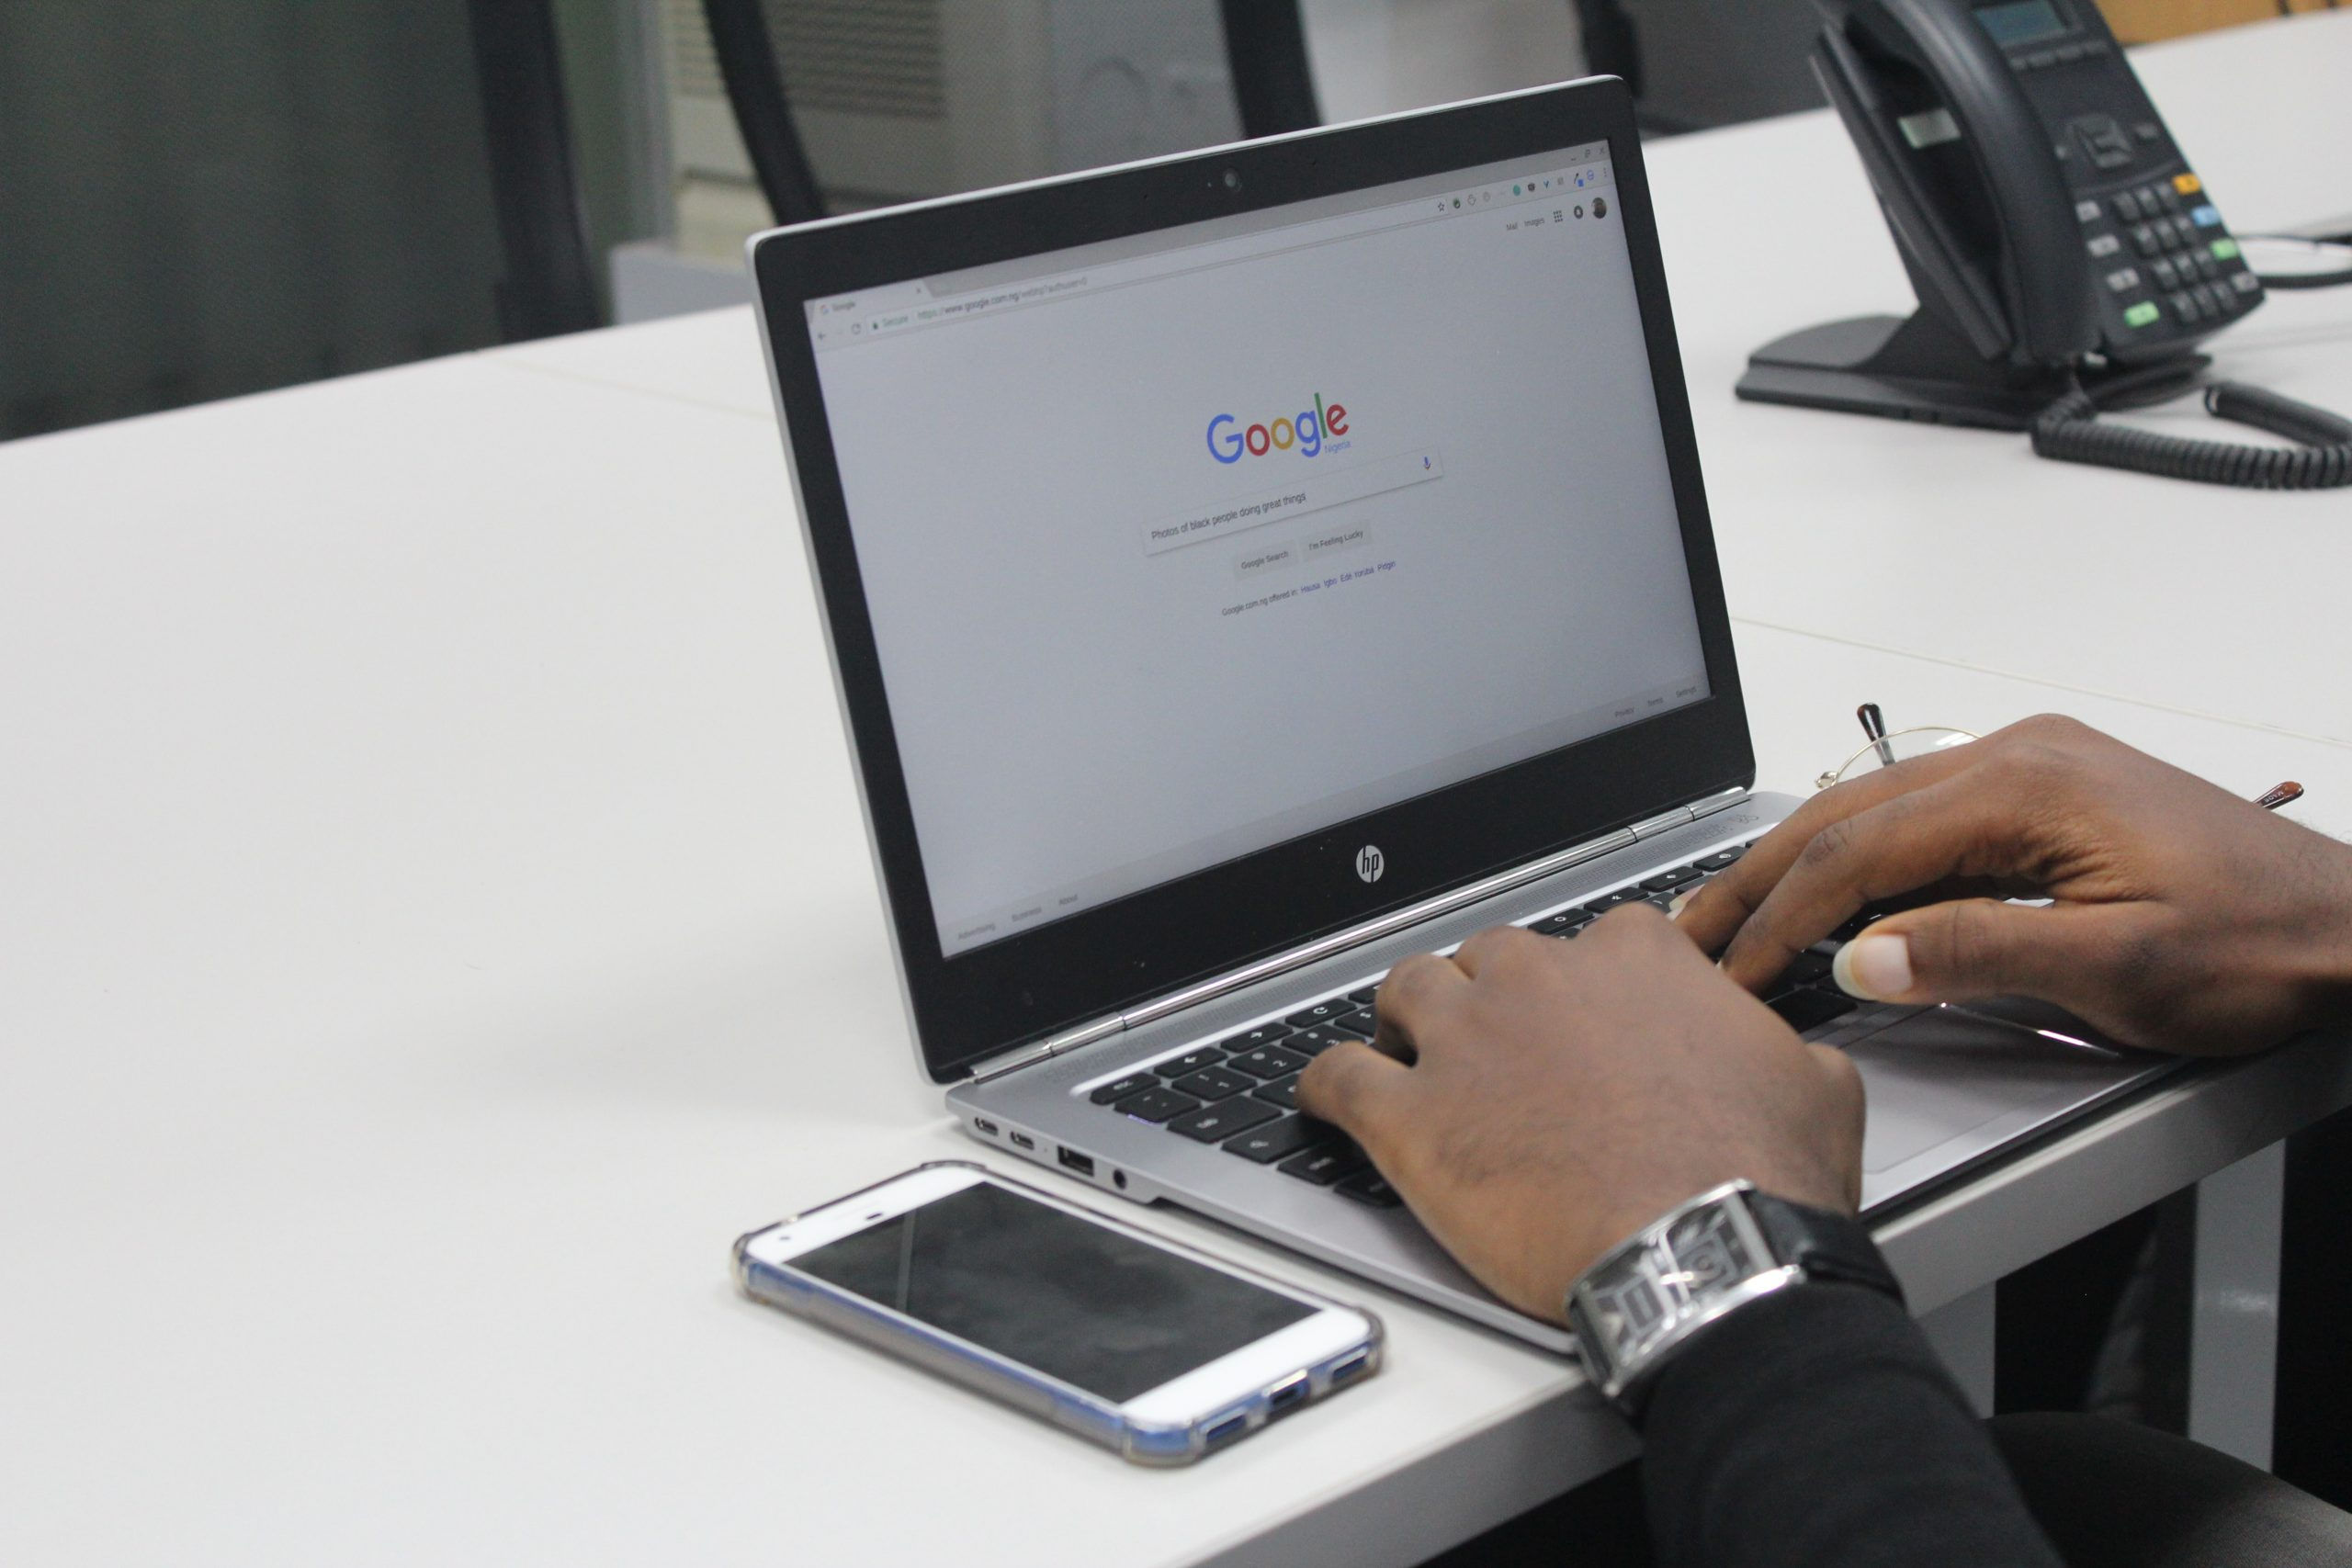 google pesquisa search pc portatil